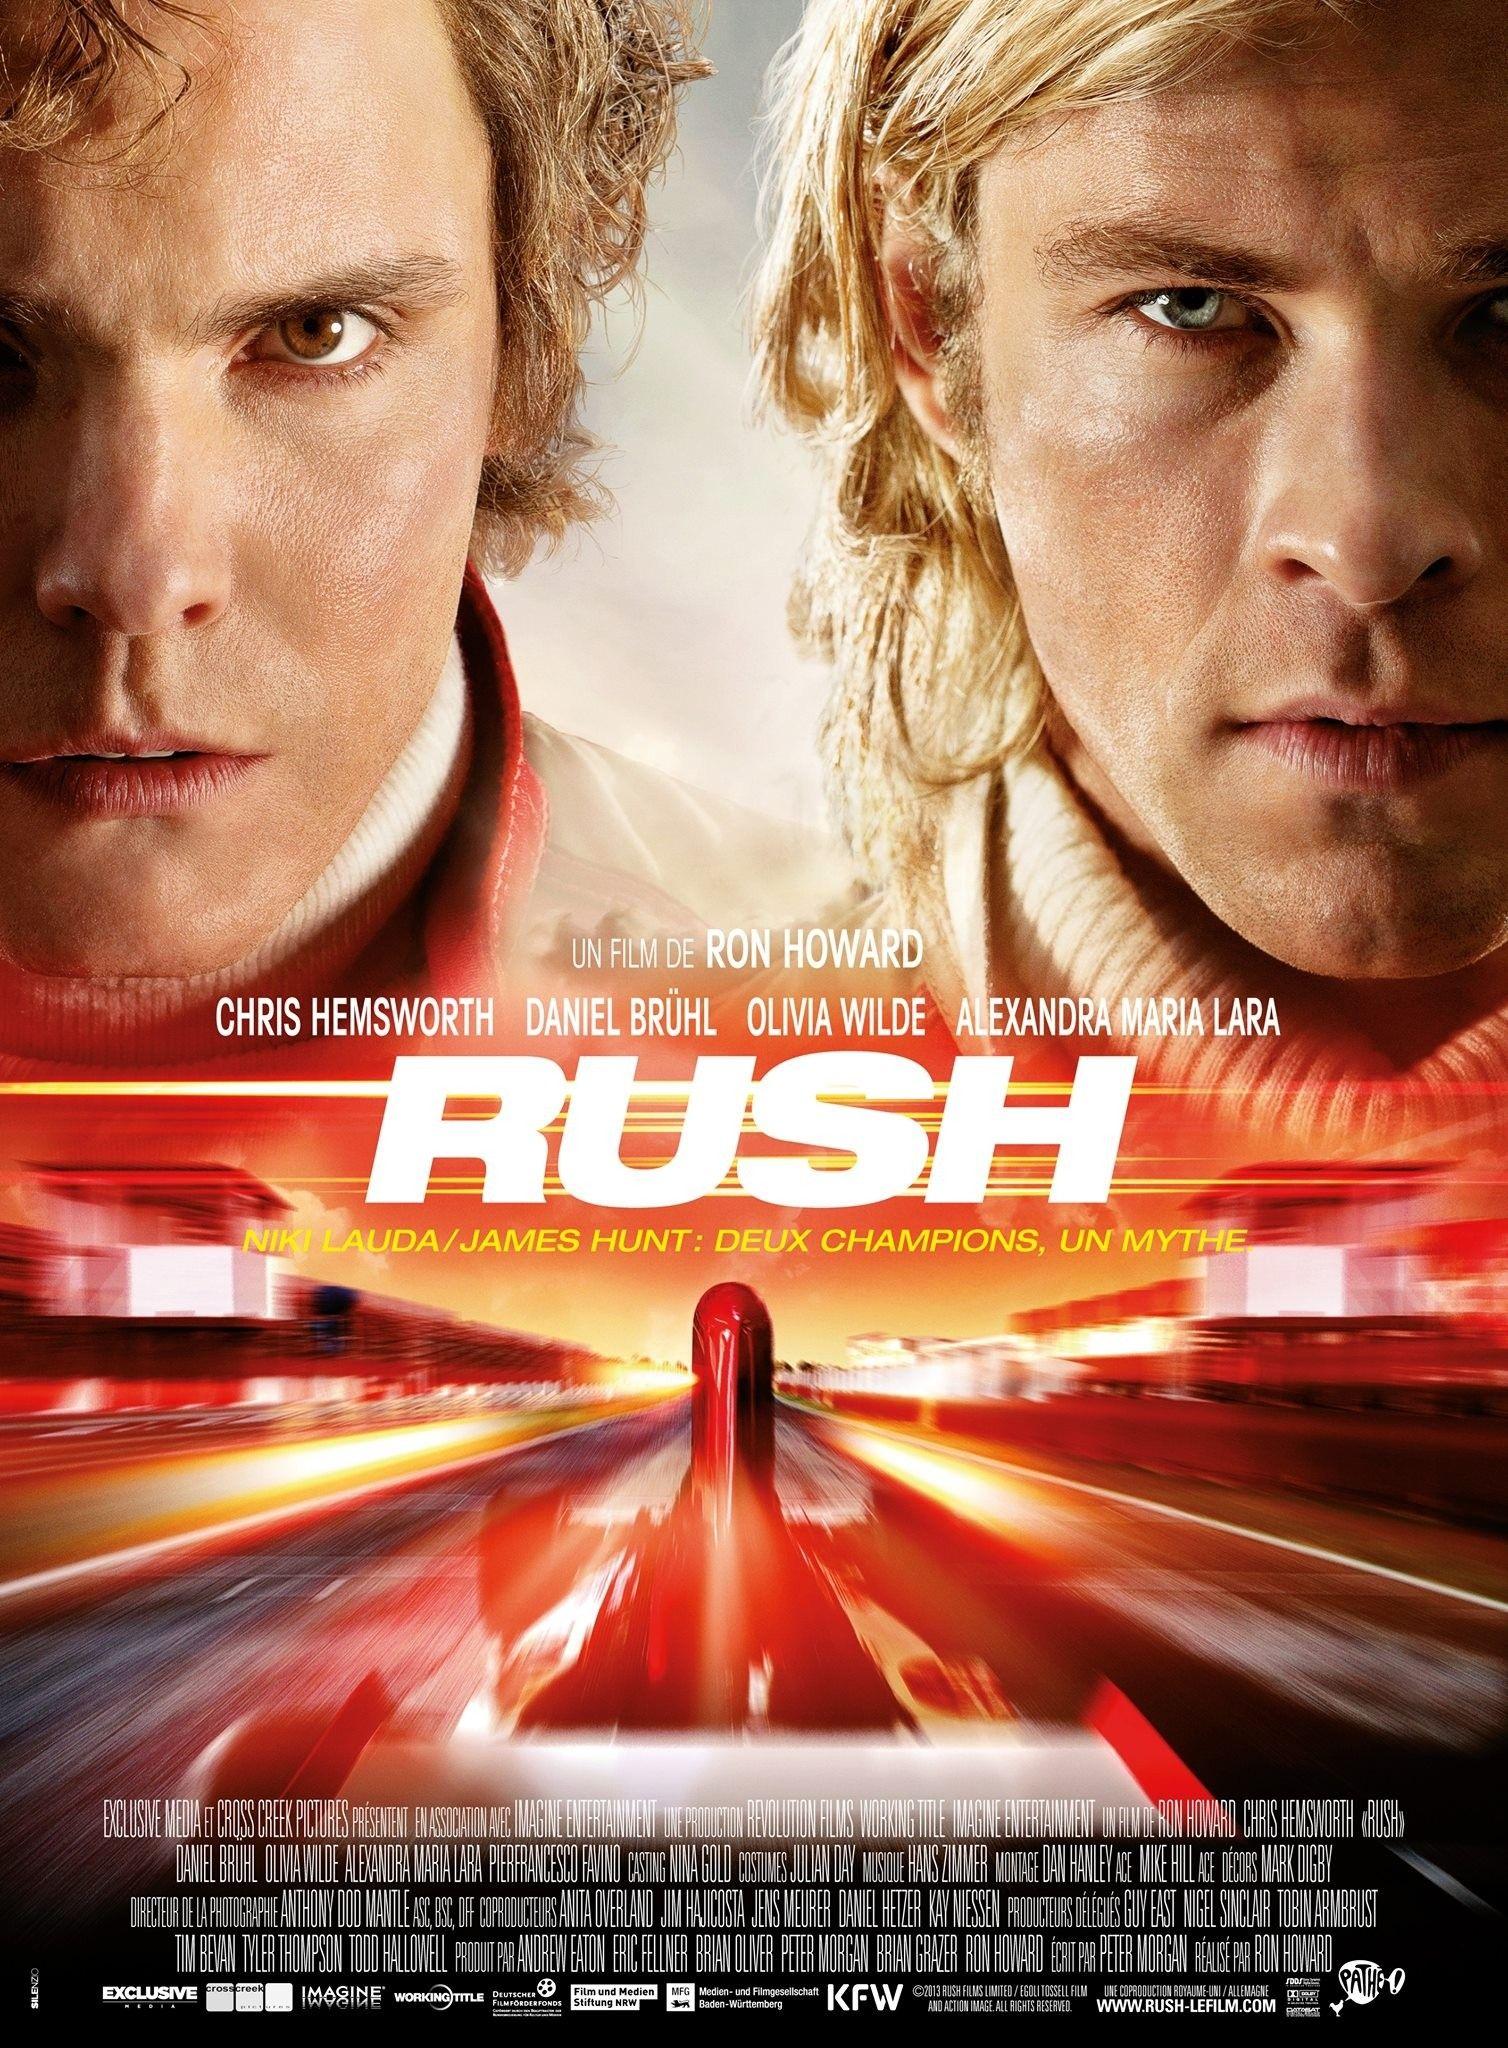 Rush 2013 Peliculas Cine Afiche De Pelicula Criticas De Cine